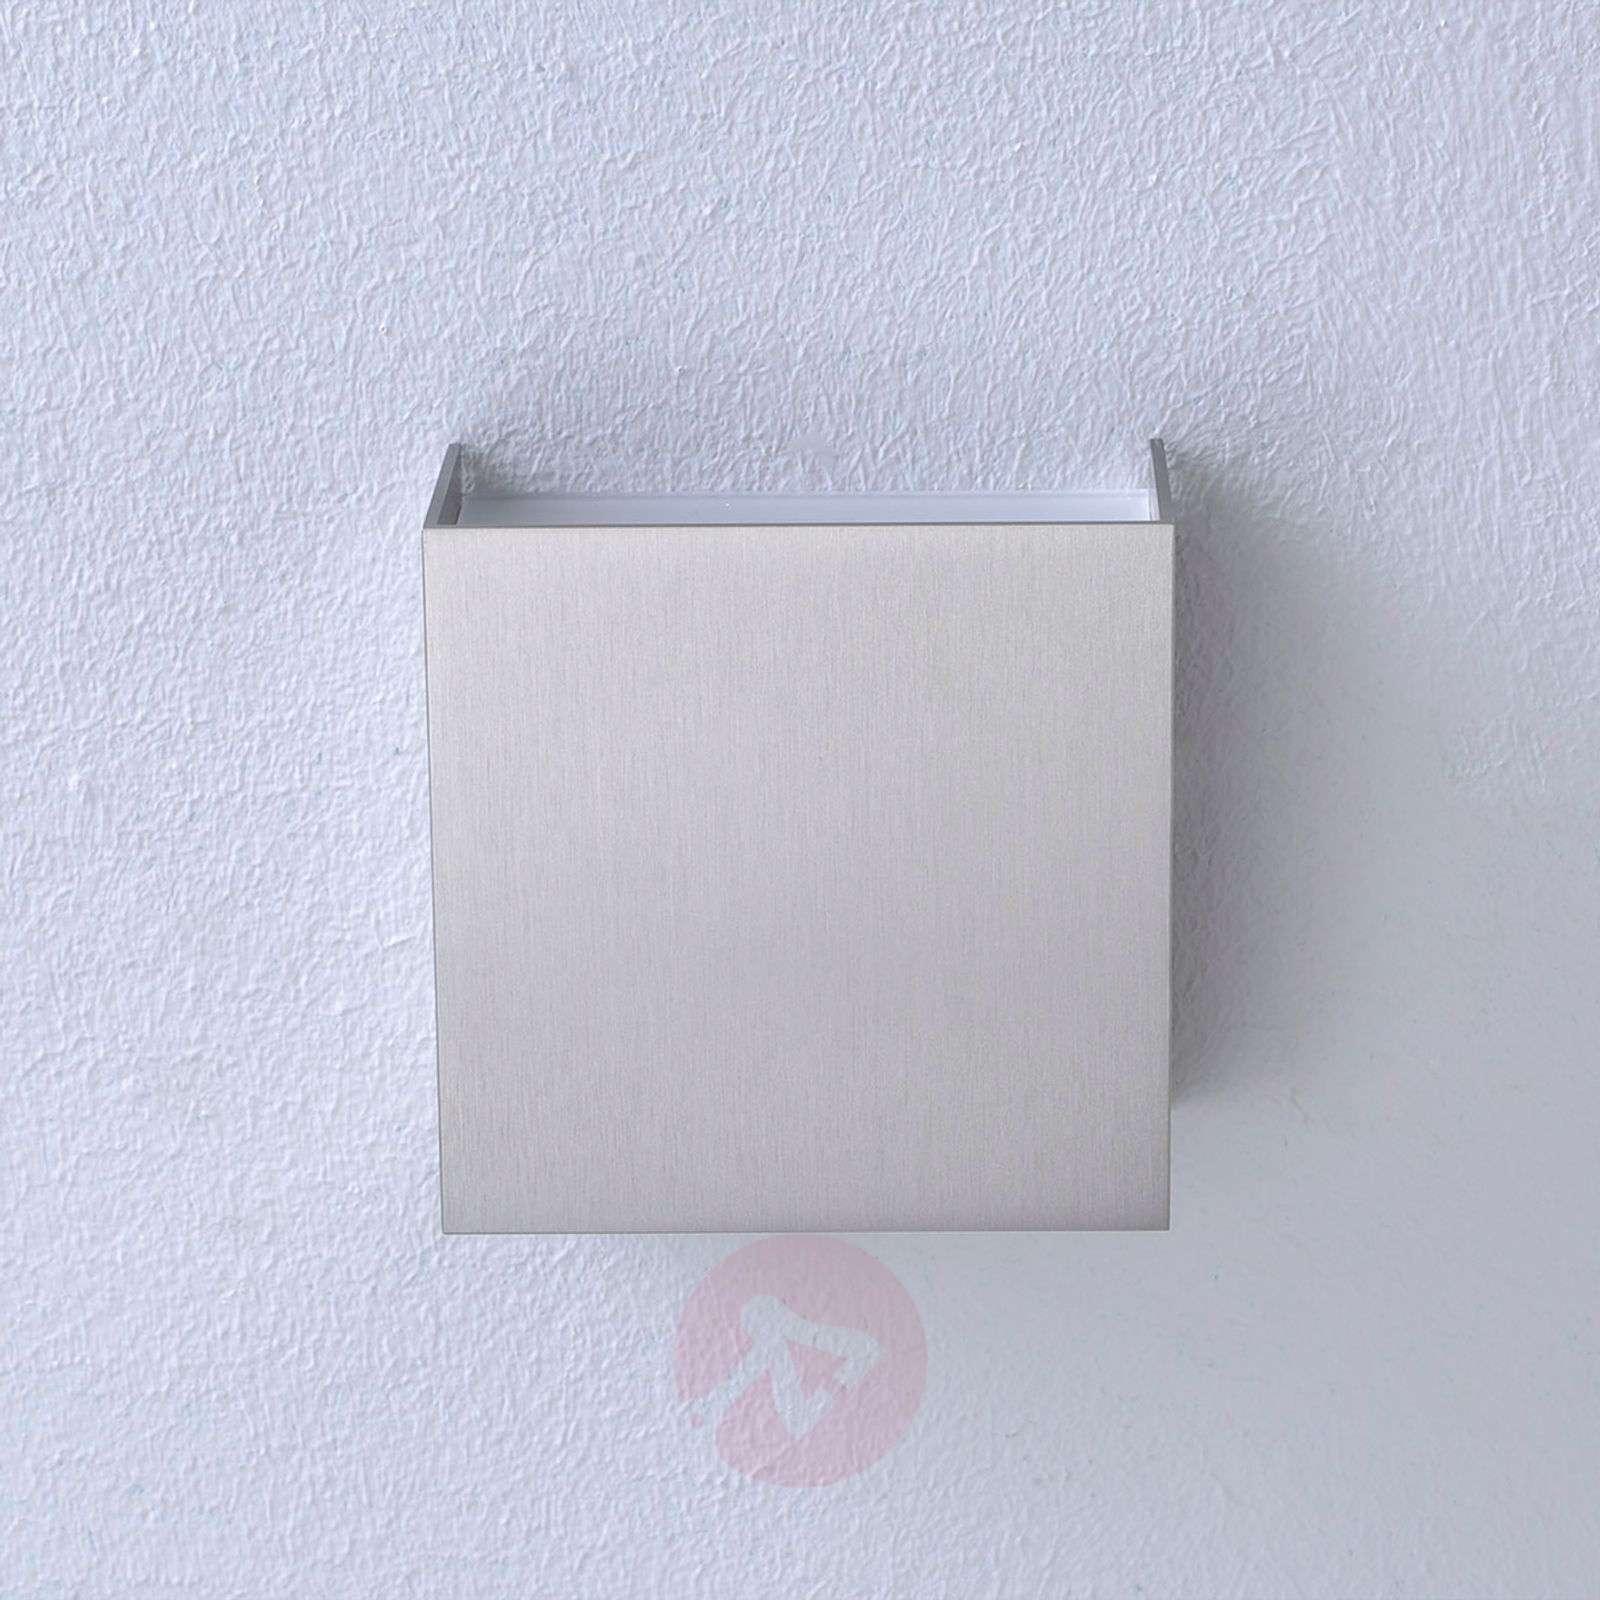 matt nickel finish Mira LED wall lamp-6722109-011